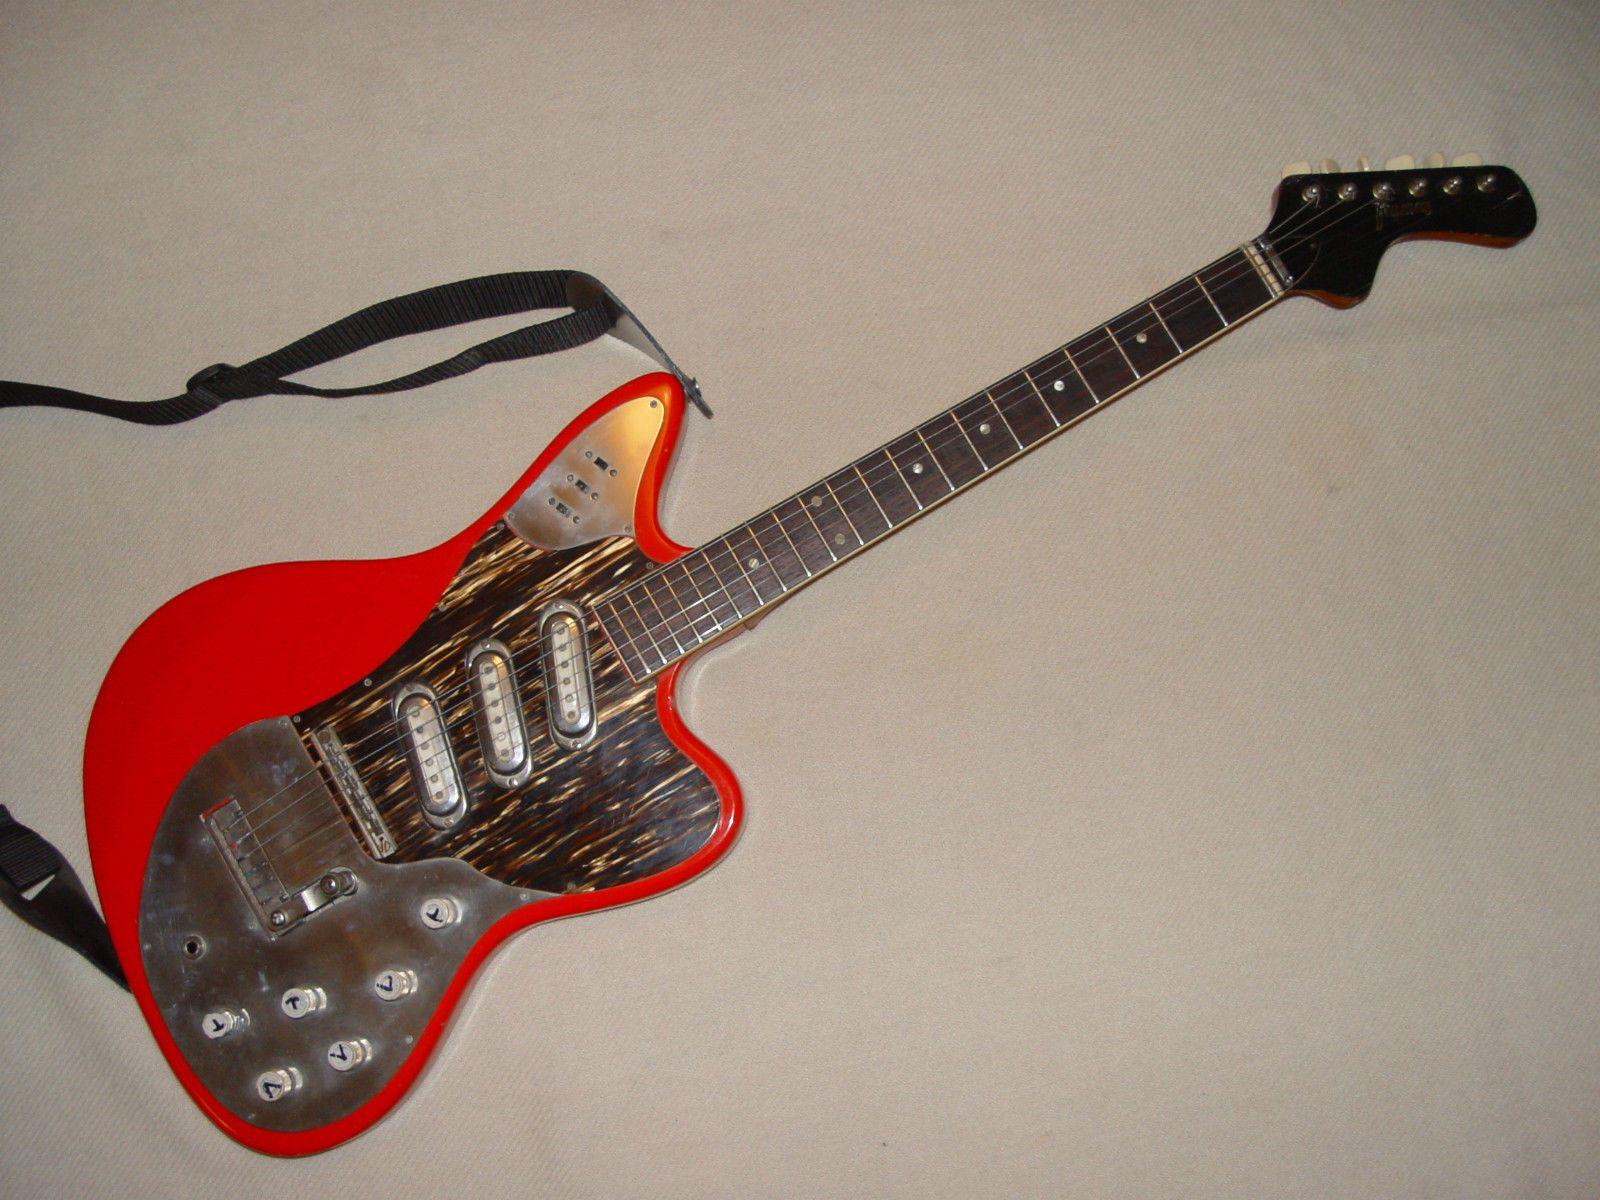 Framus Strato de Luxe E Gitarre guitar 1964 in Musikinstrumente Vintage Musikinstrumente Vintage